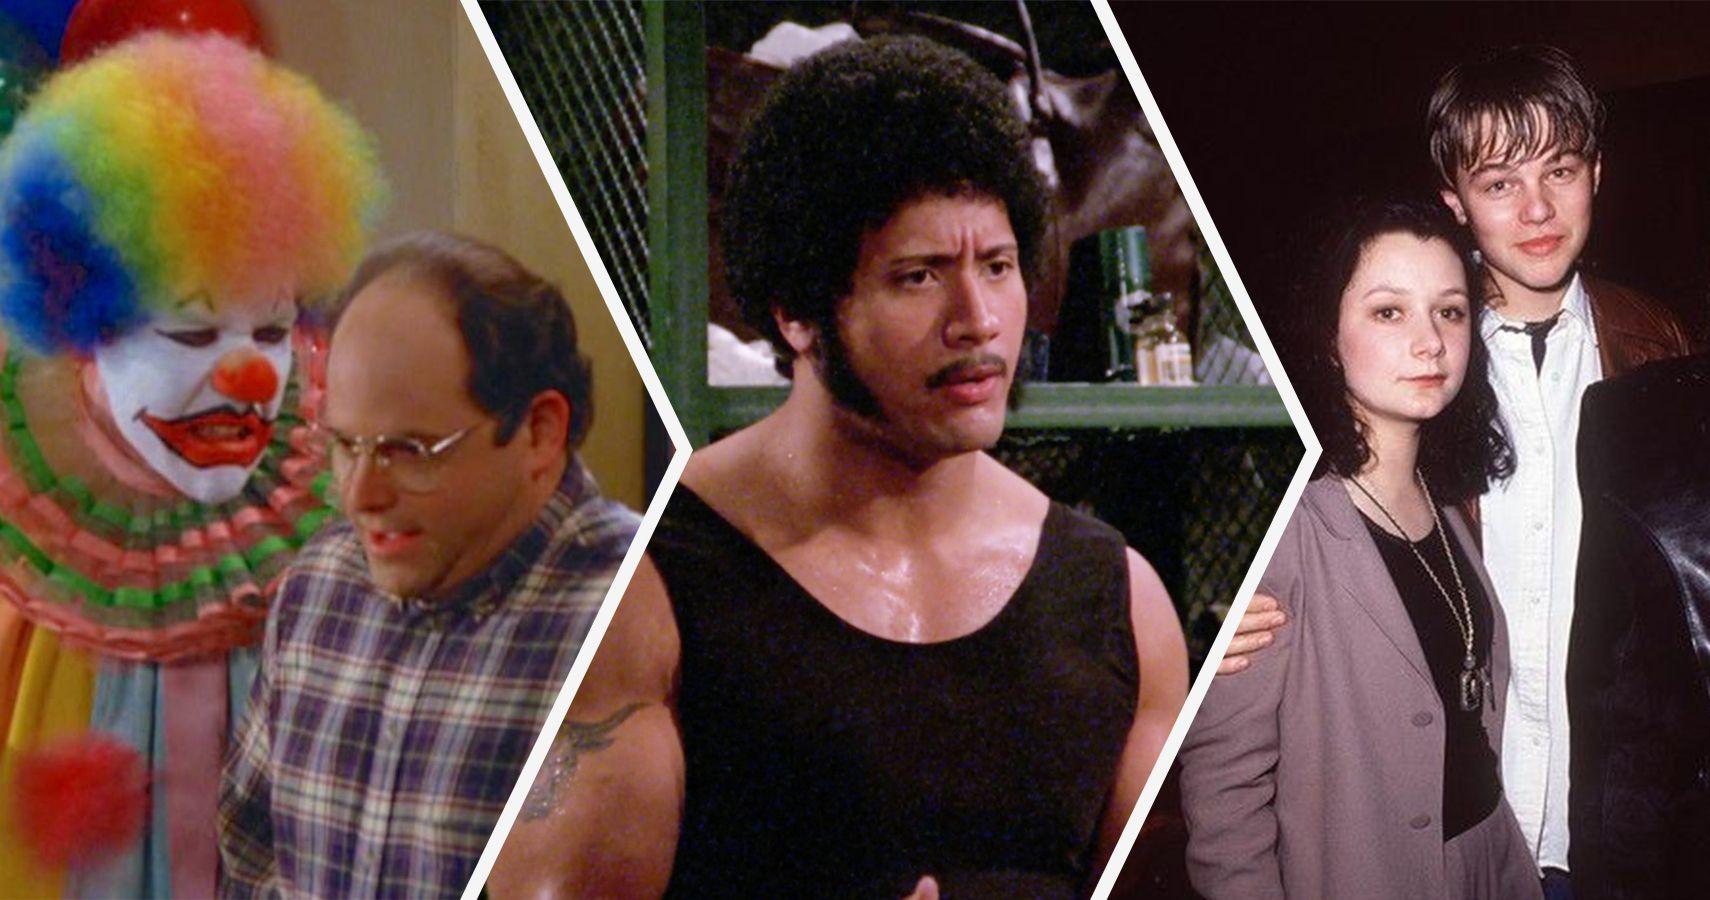 Jon Favreau Seinfeld Wwwtollebildcom